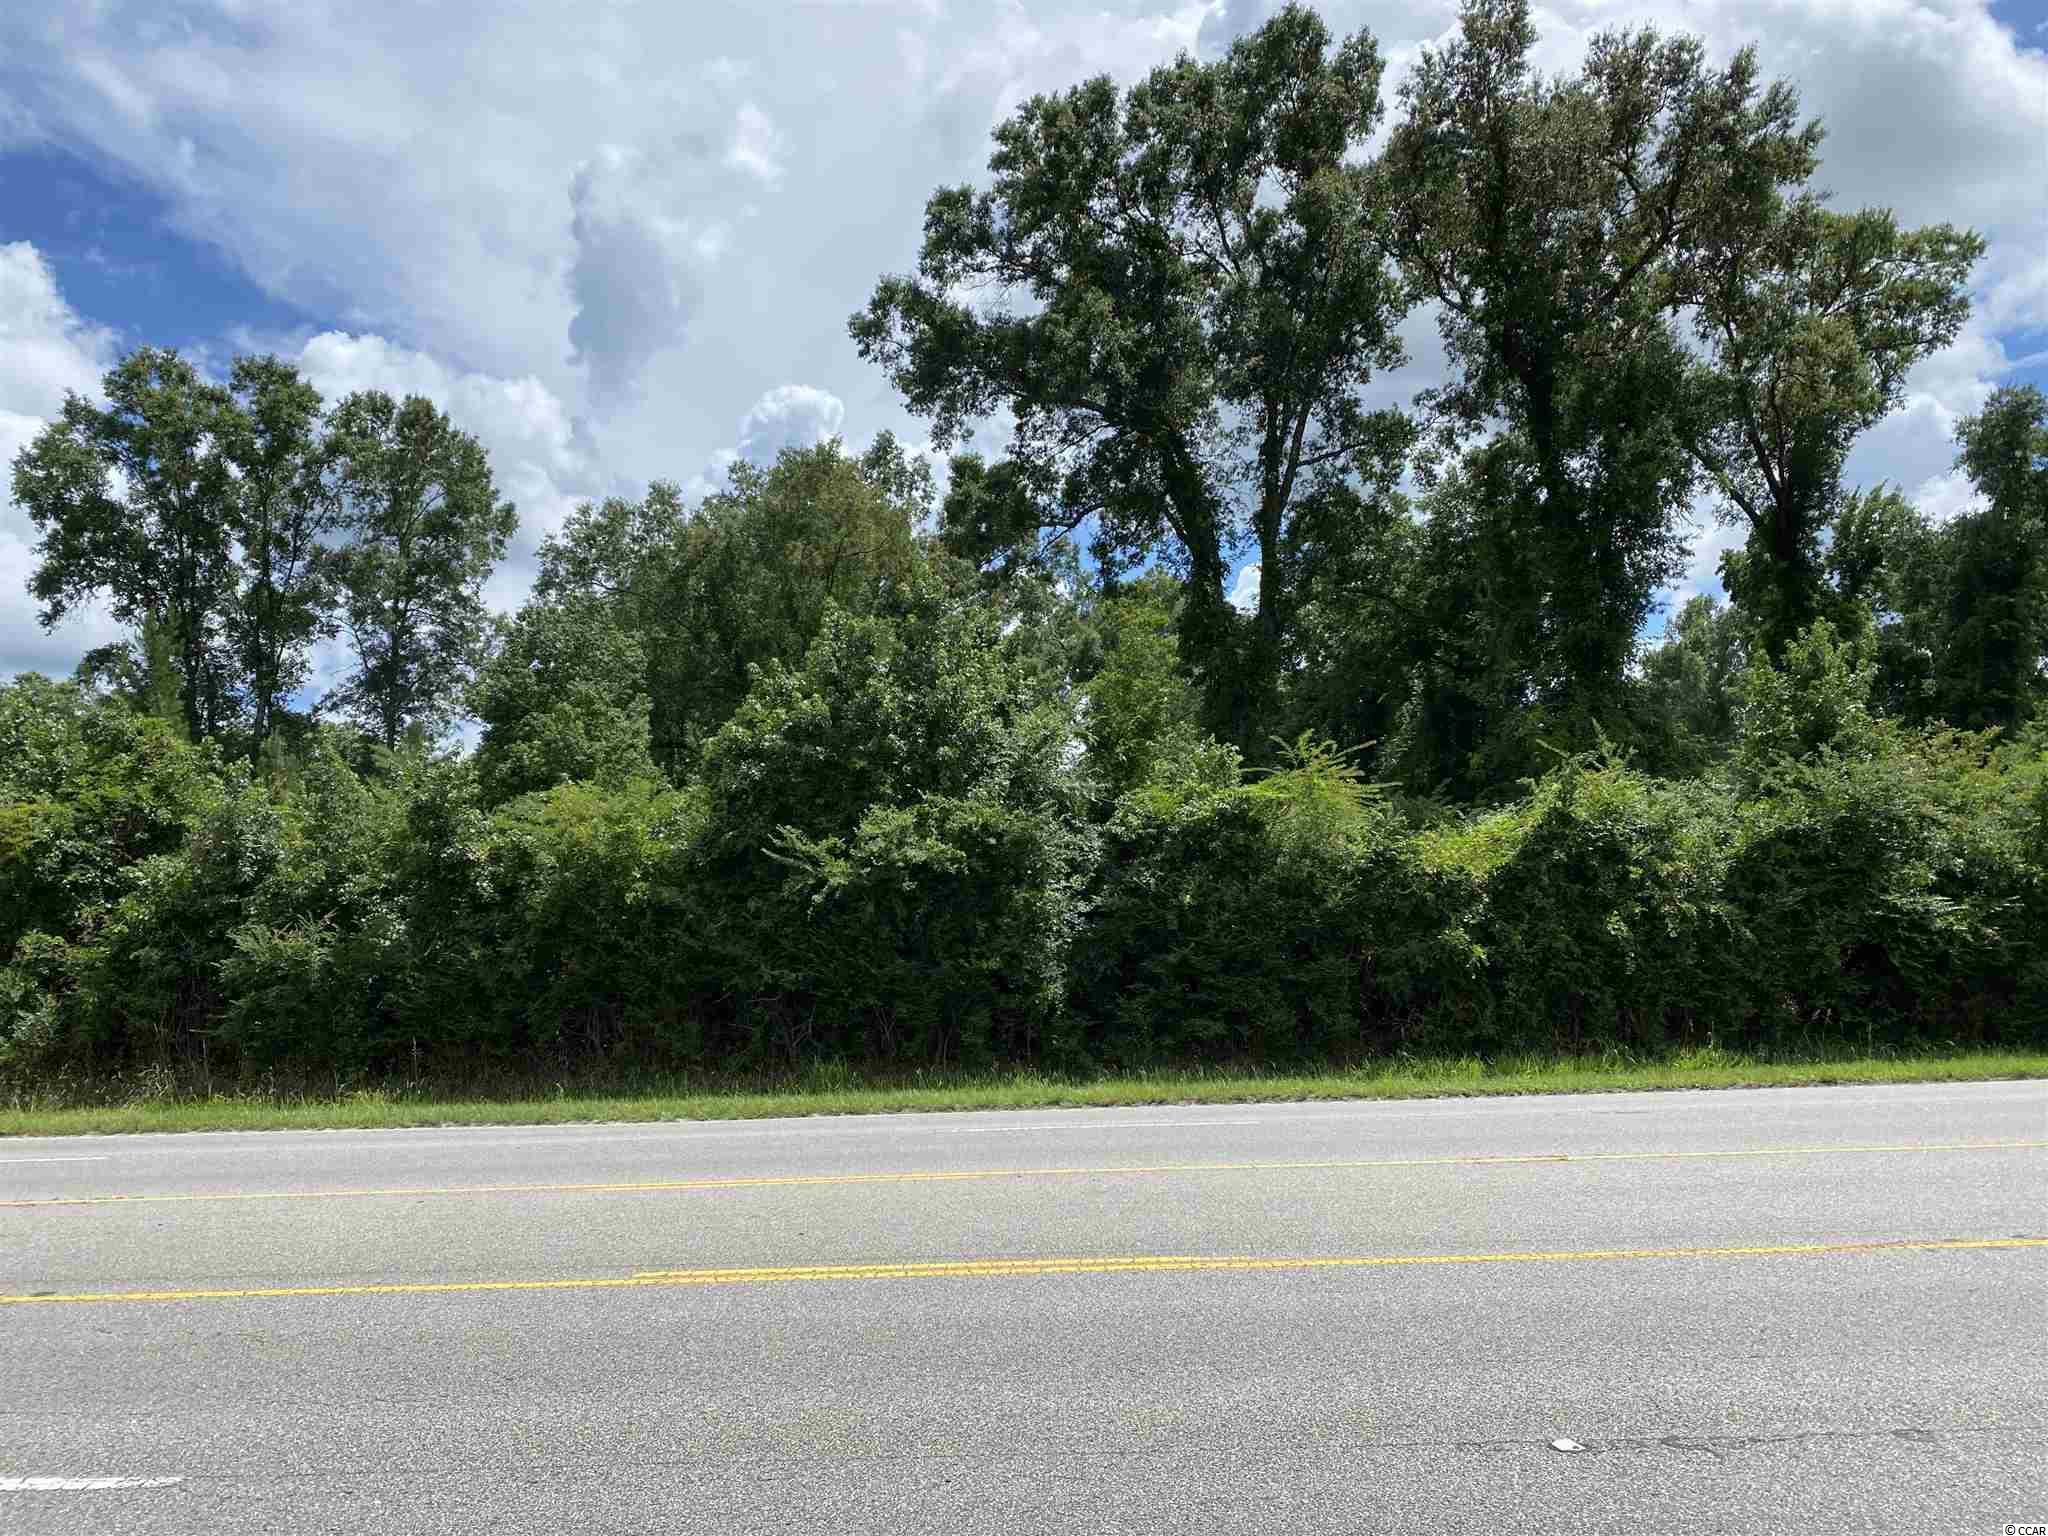 Tbd Highway 378 Property Photo 6